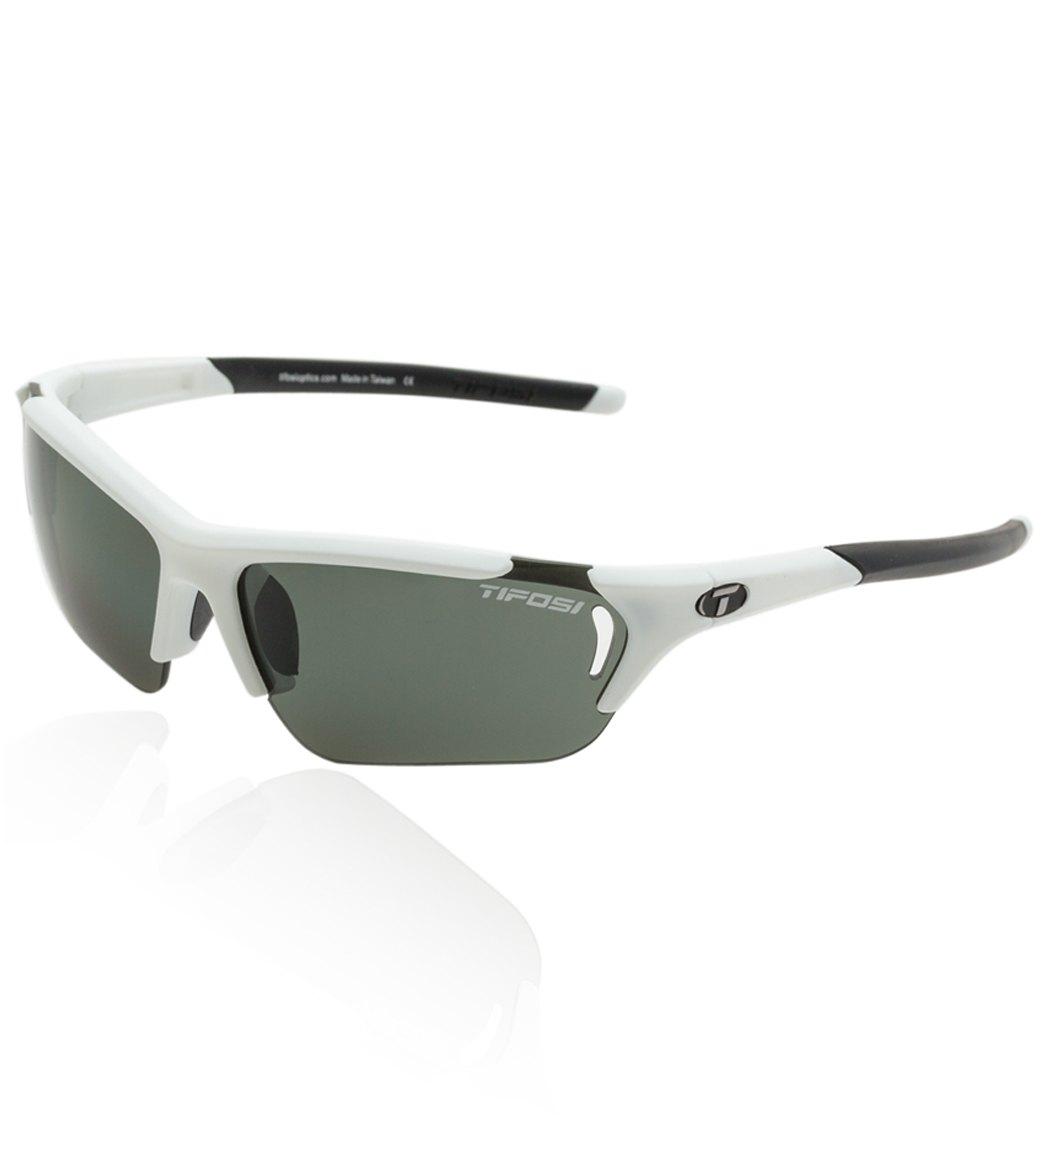 3acbc7a8be Tifosi Radius FC Polarized Sunglasses at SwimOutlet.com - Free Shipping